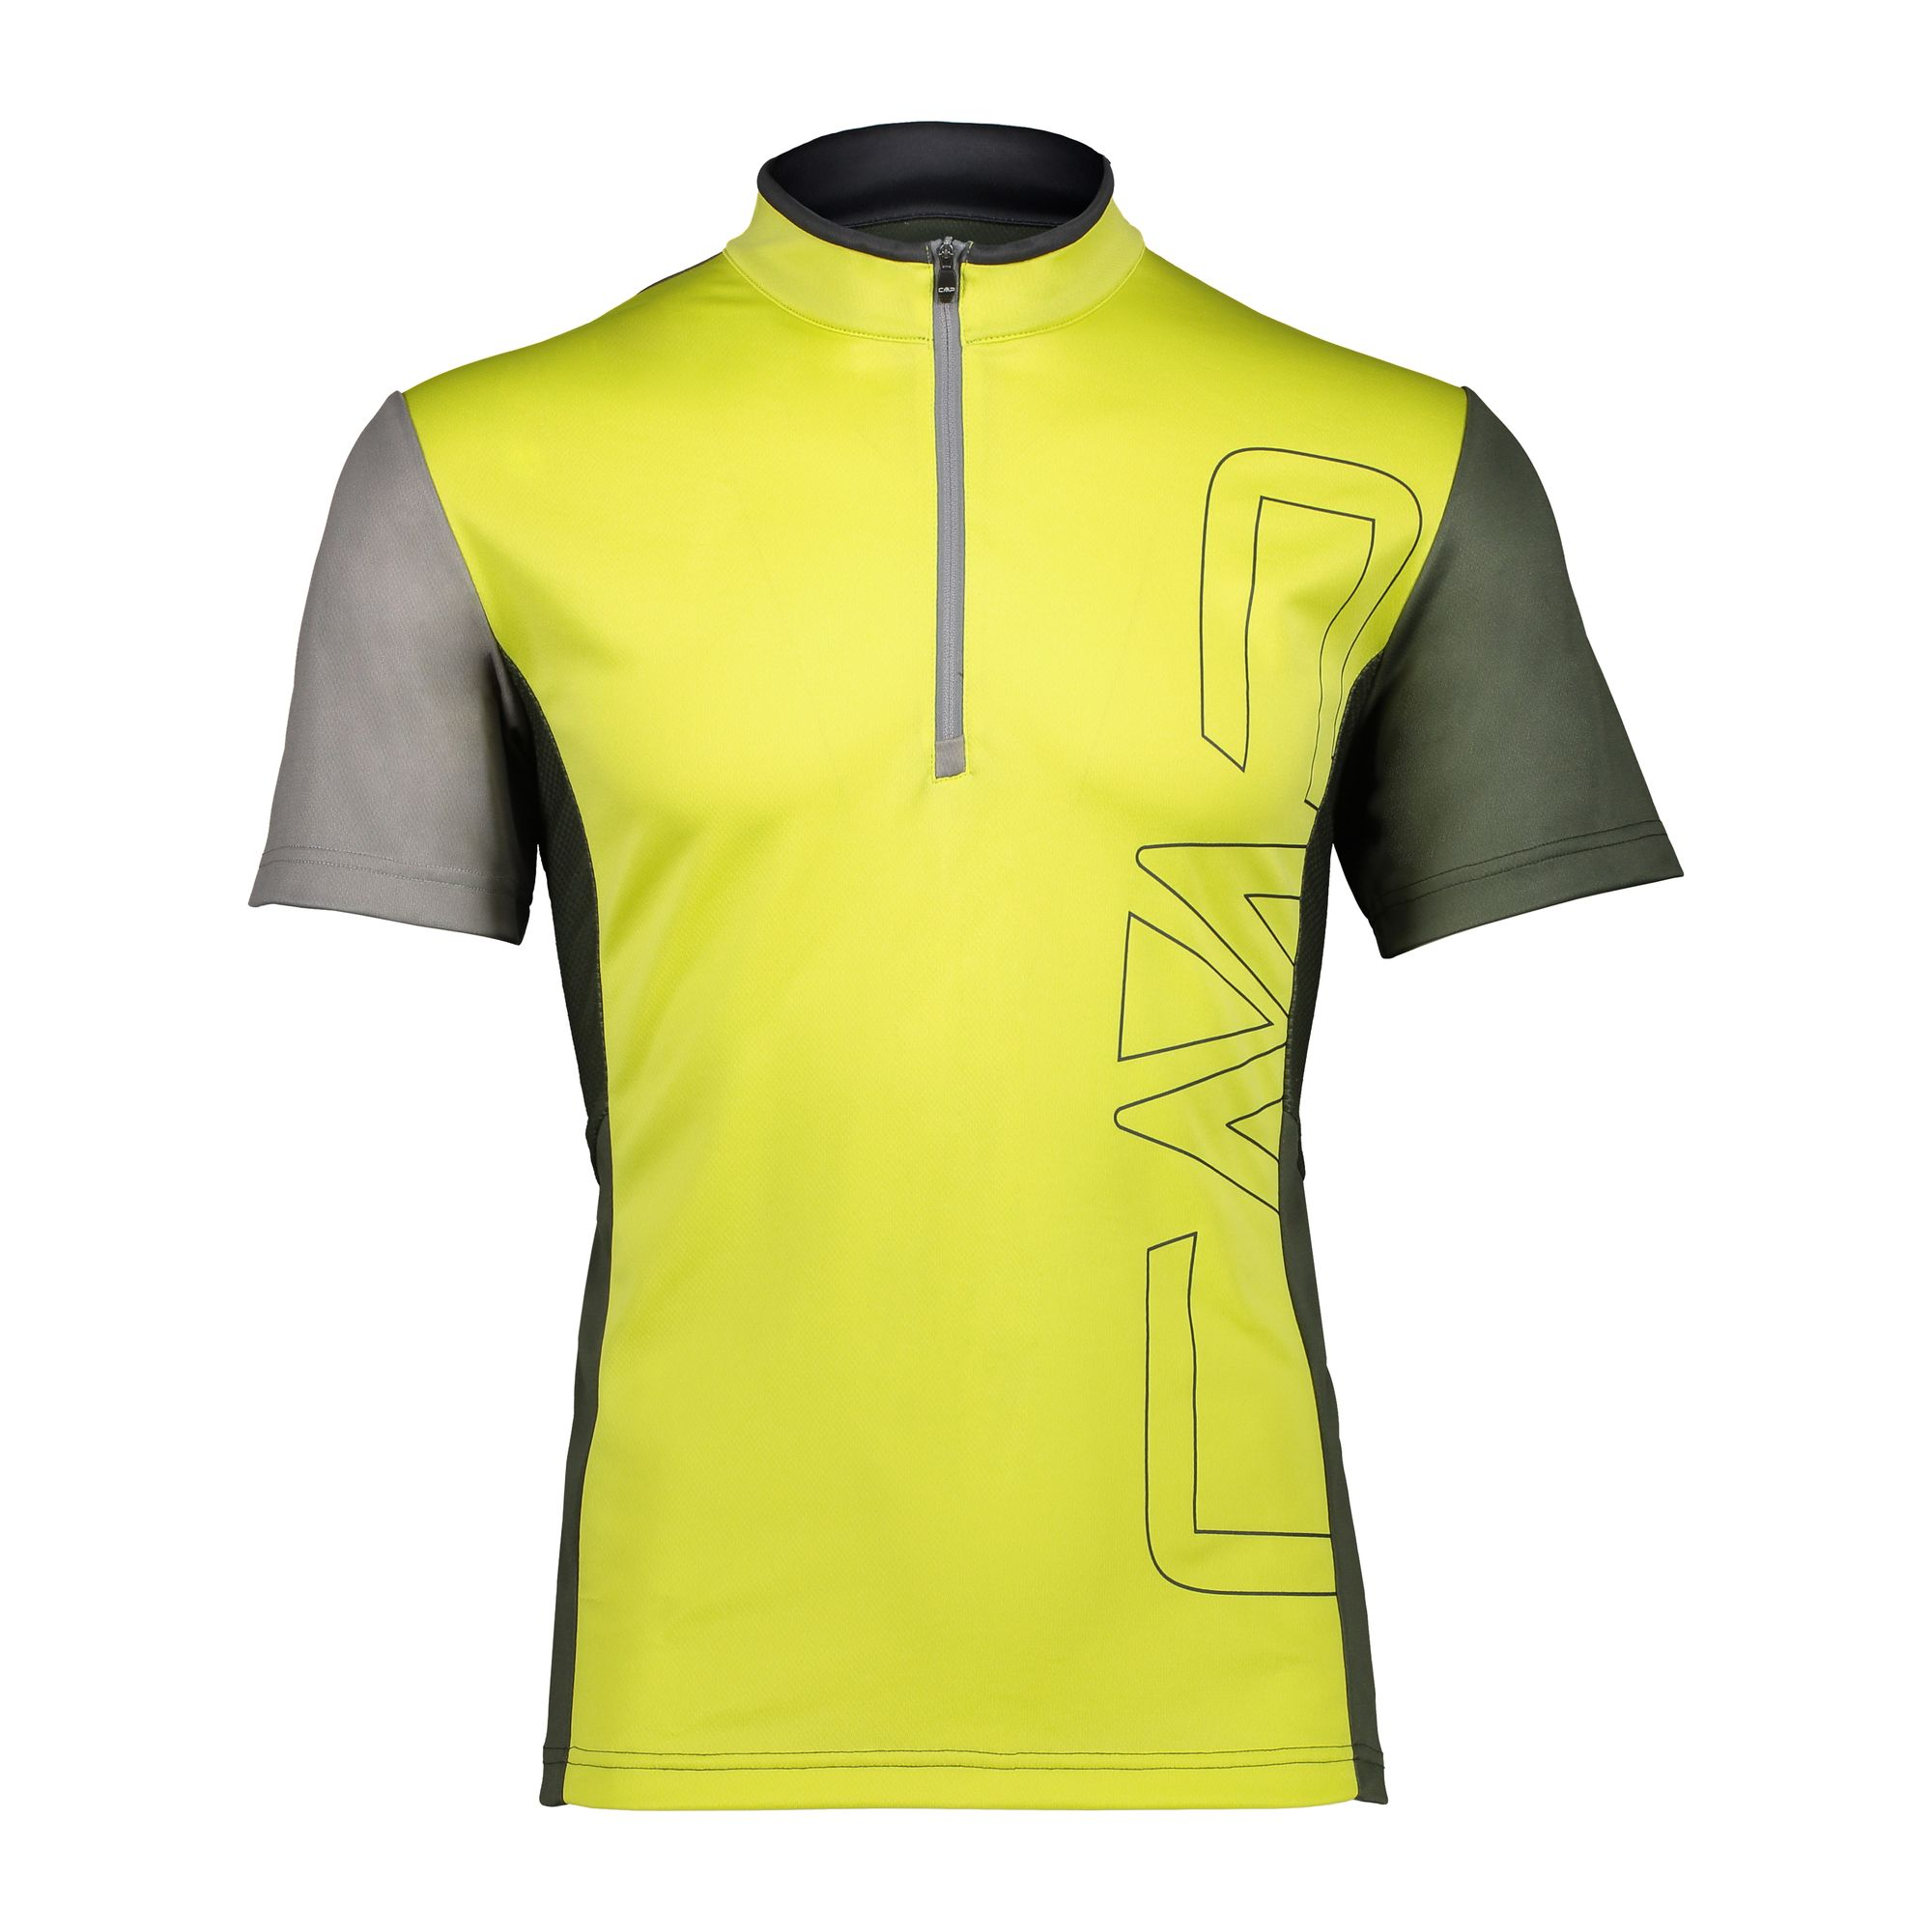 Pánske cyklistické tričko CAMPAGNOLO Free Bike Yellow Žltá 56